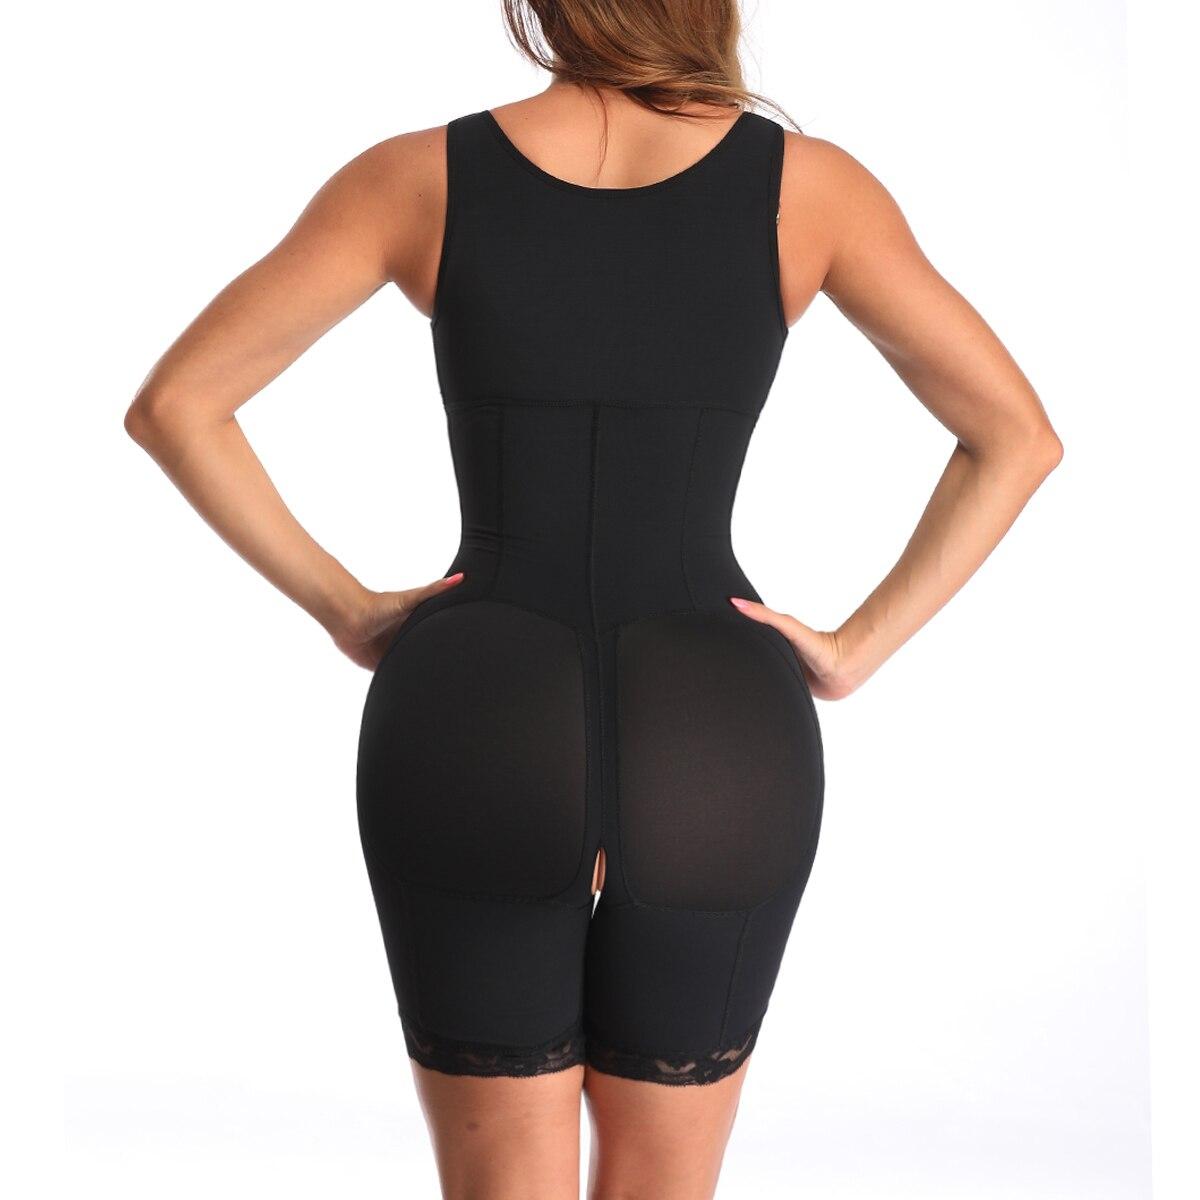 6XL Shapewear Slimming Waist Bodysuit Powernet Lingerie Full Body Shaper for Women Bum Lifter Tummy Control Zipper Thigh Slimmer